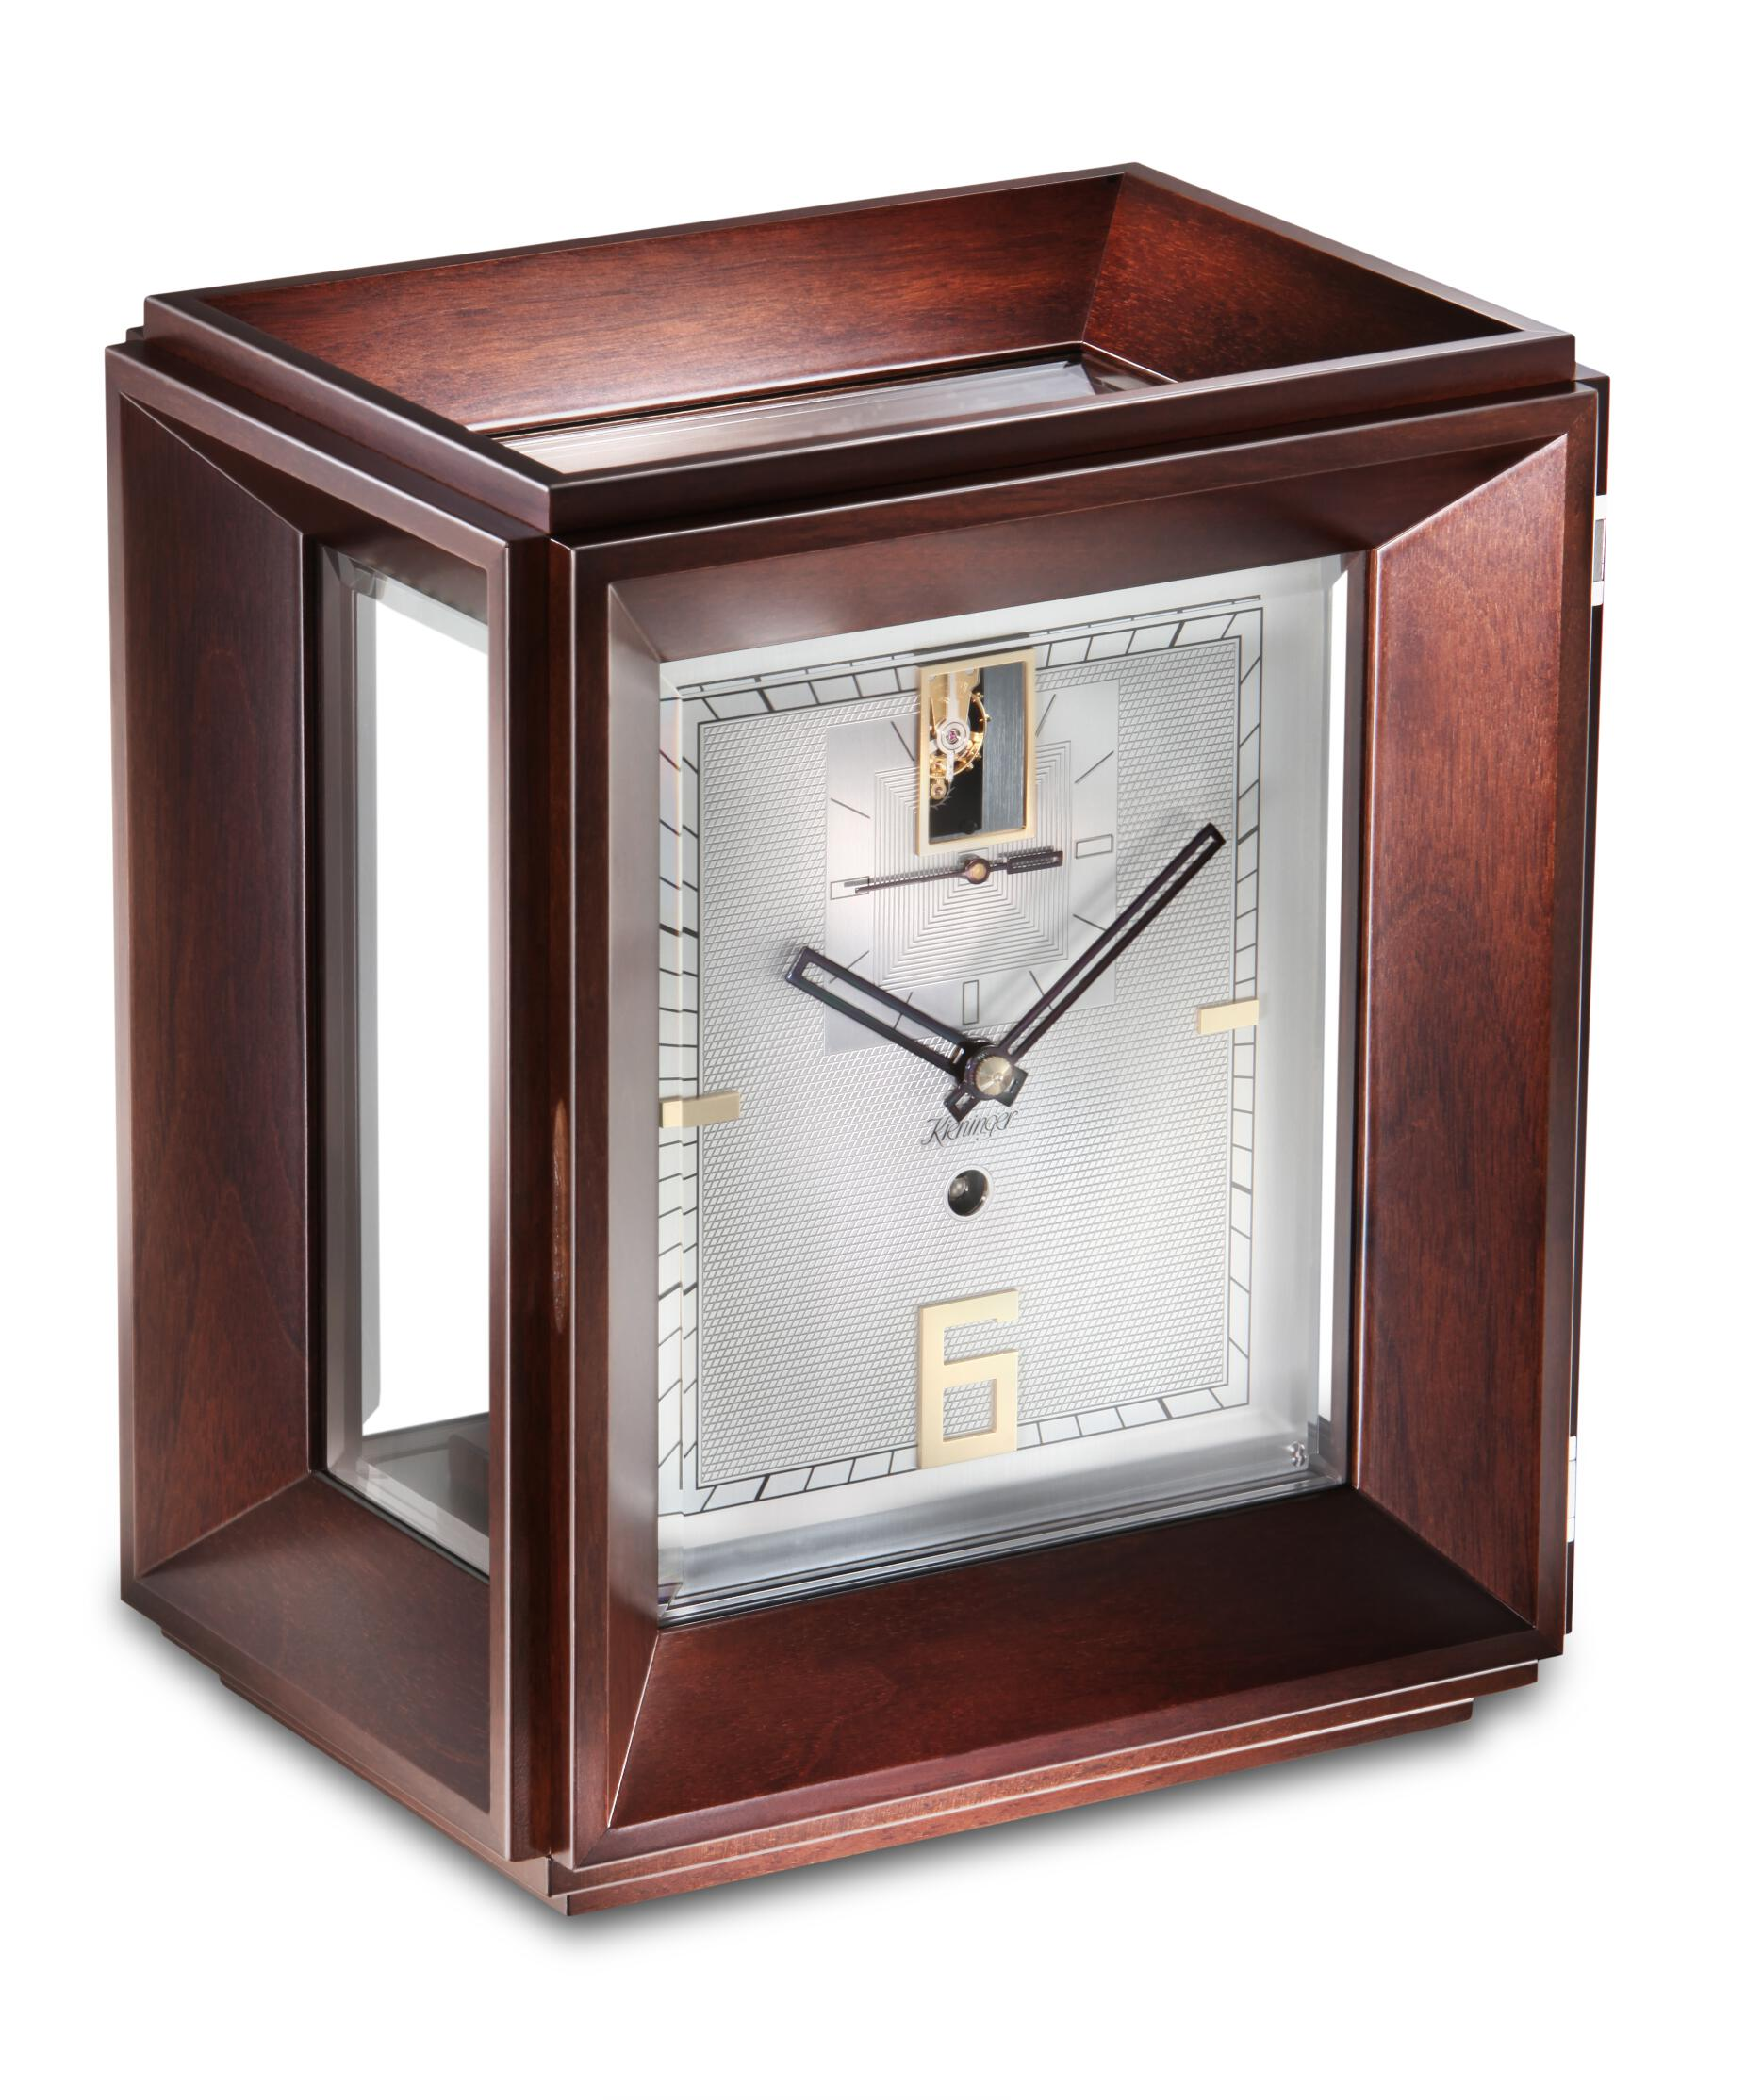 Kieninger suburban clock in berea ohio since 1953 1271 22 01 amipublicfo Images